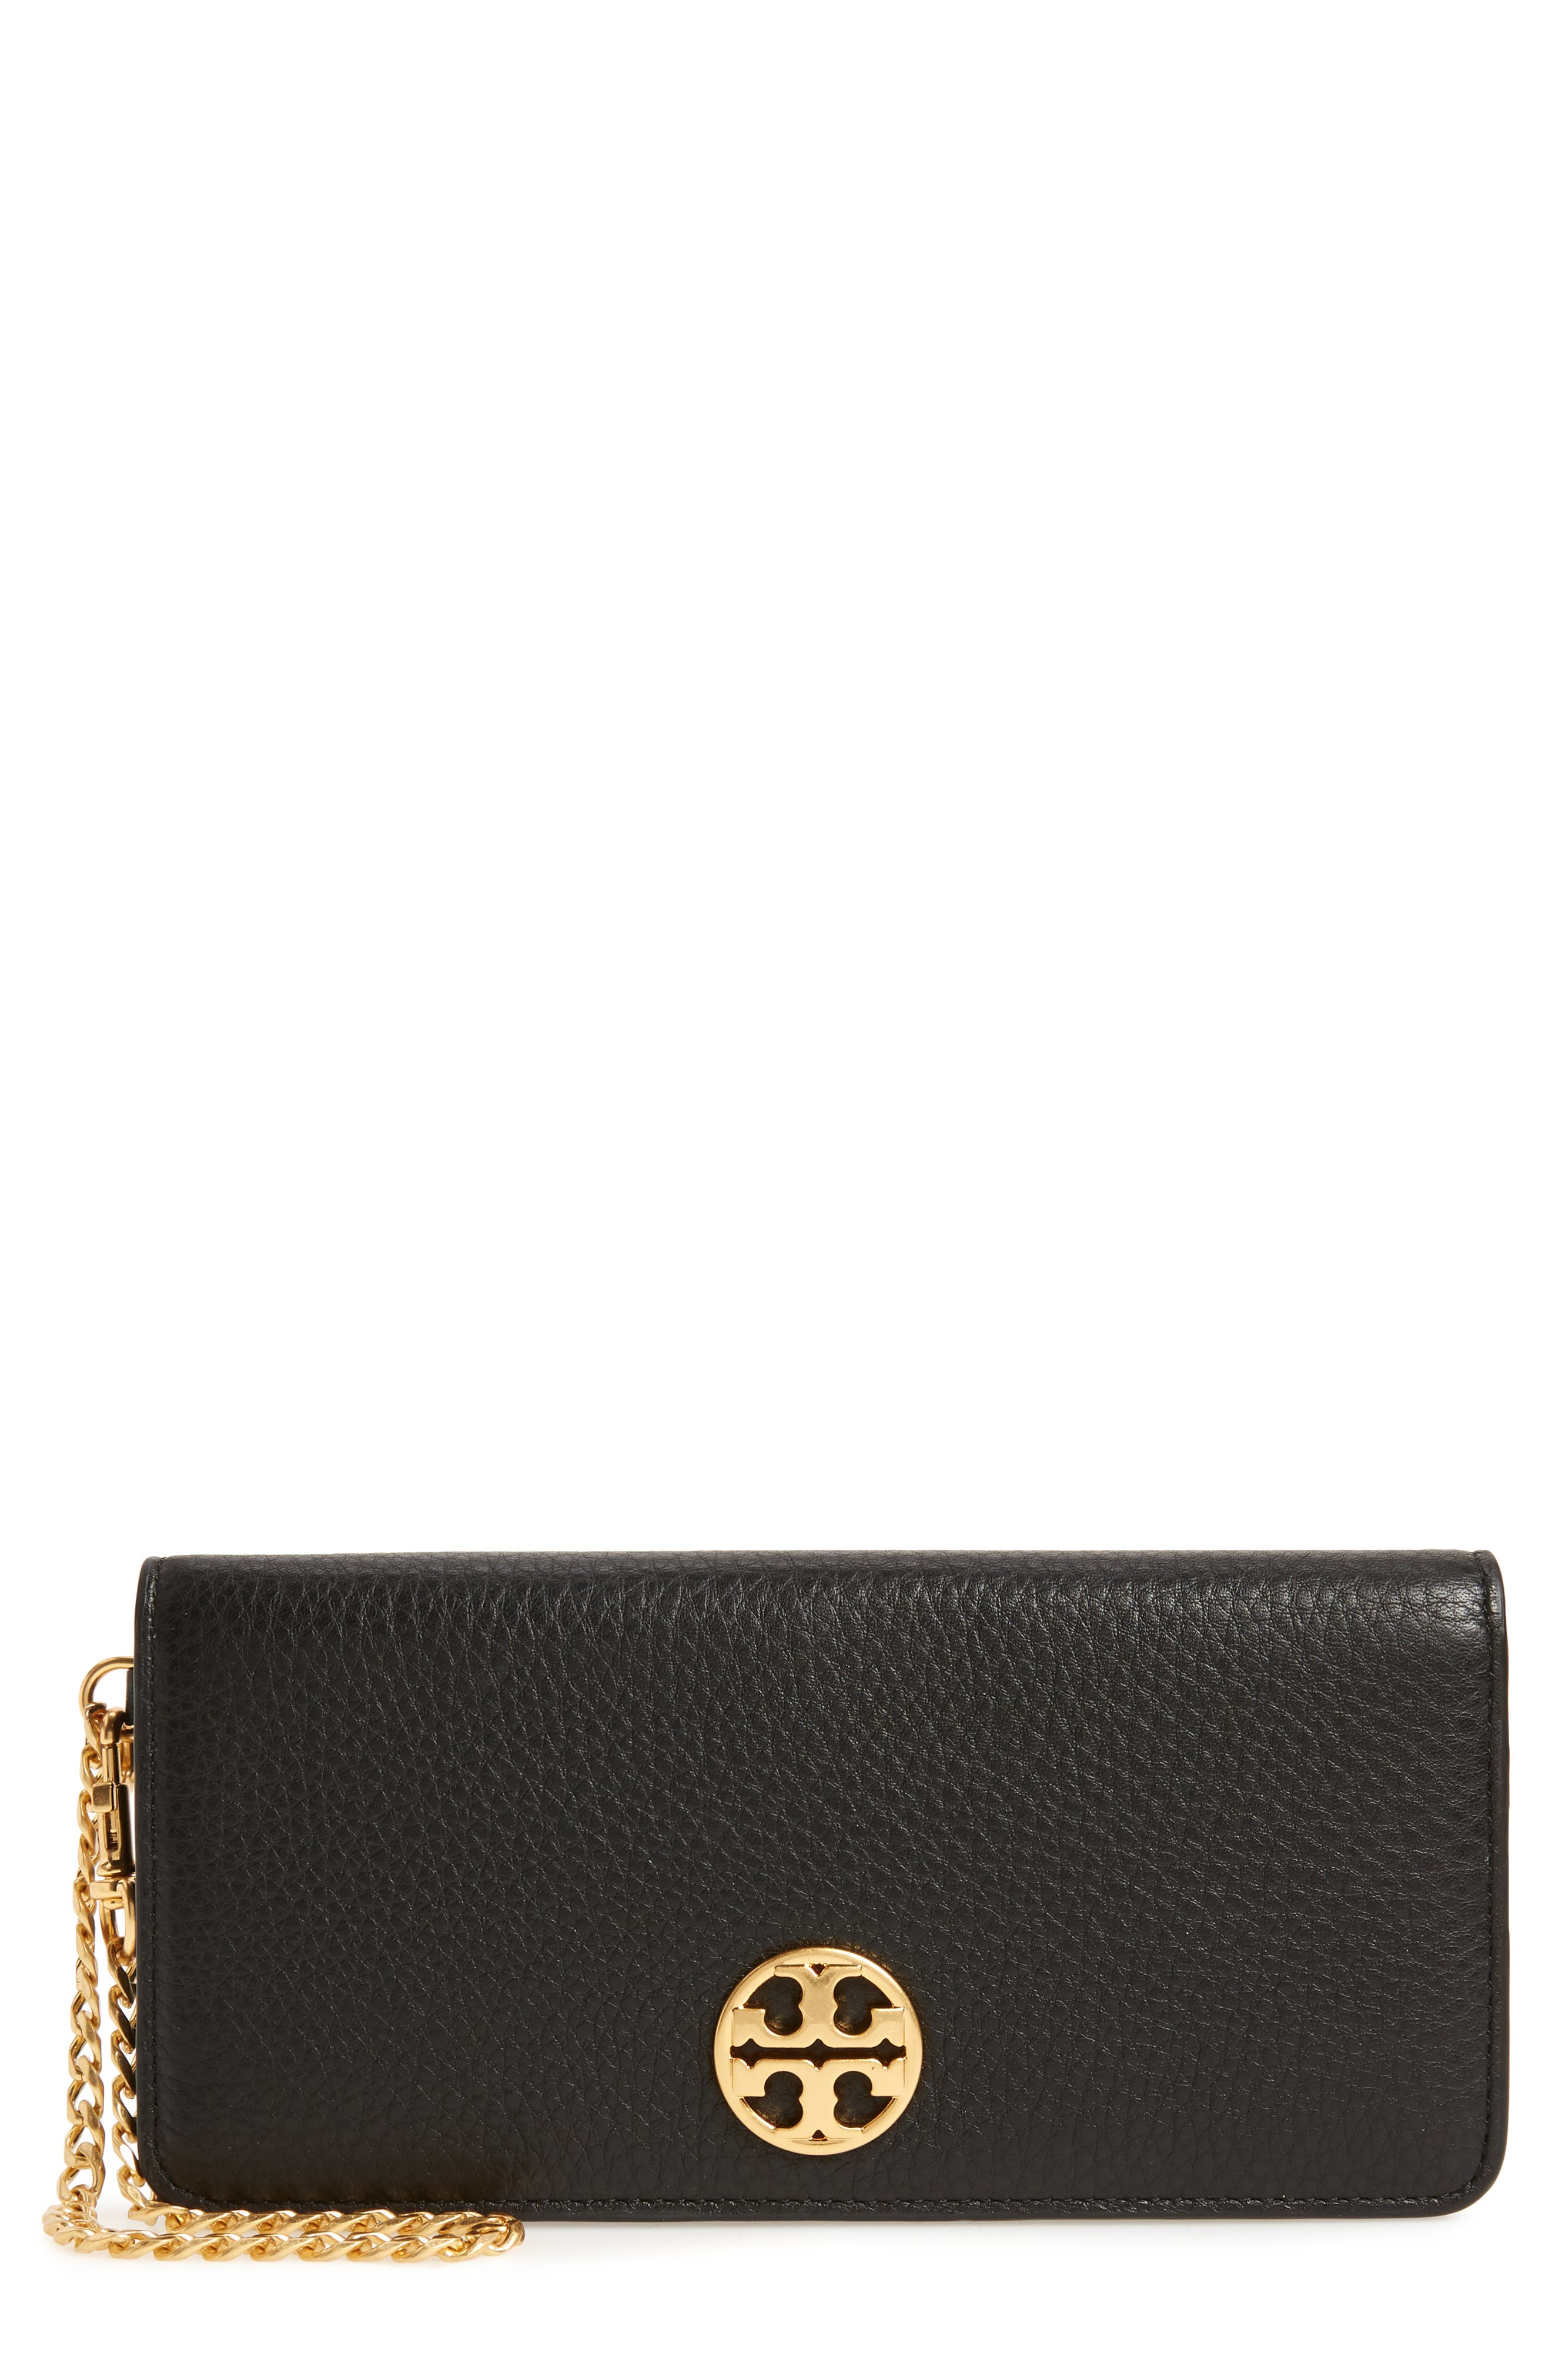 TORY BURCH, Chelsea Leather Wristlet Wallet, Main thumbnail 1, color, 001